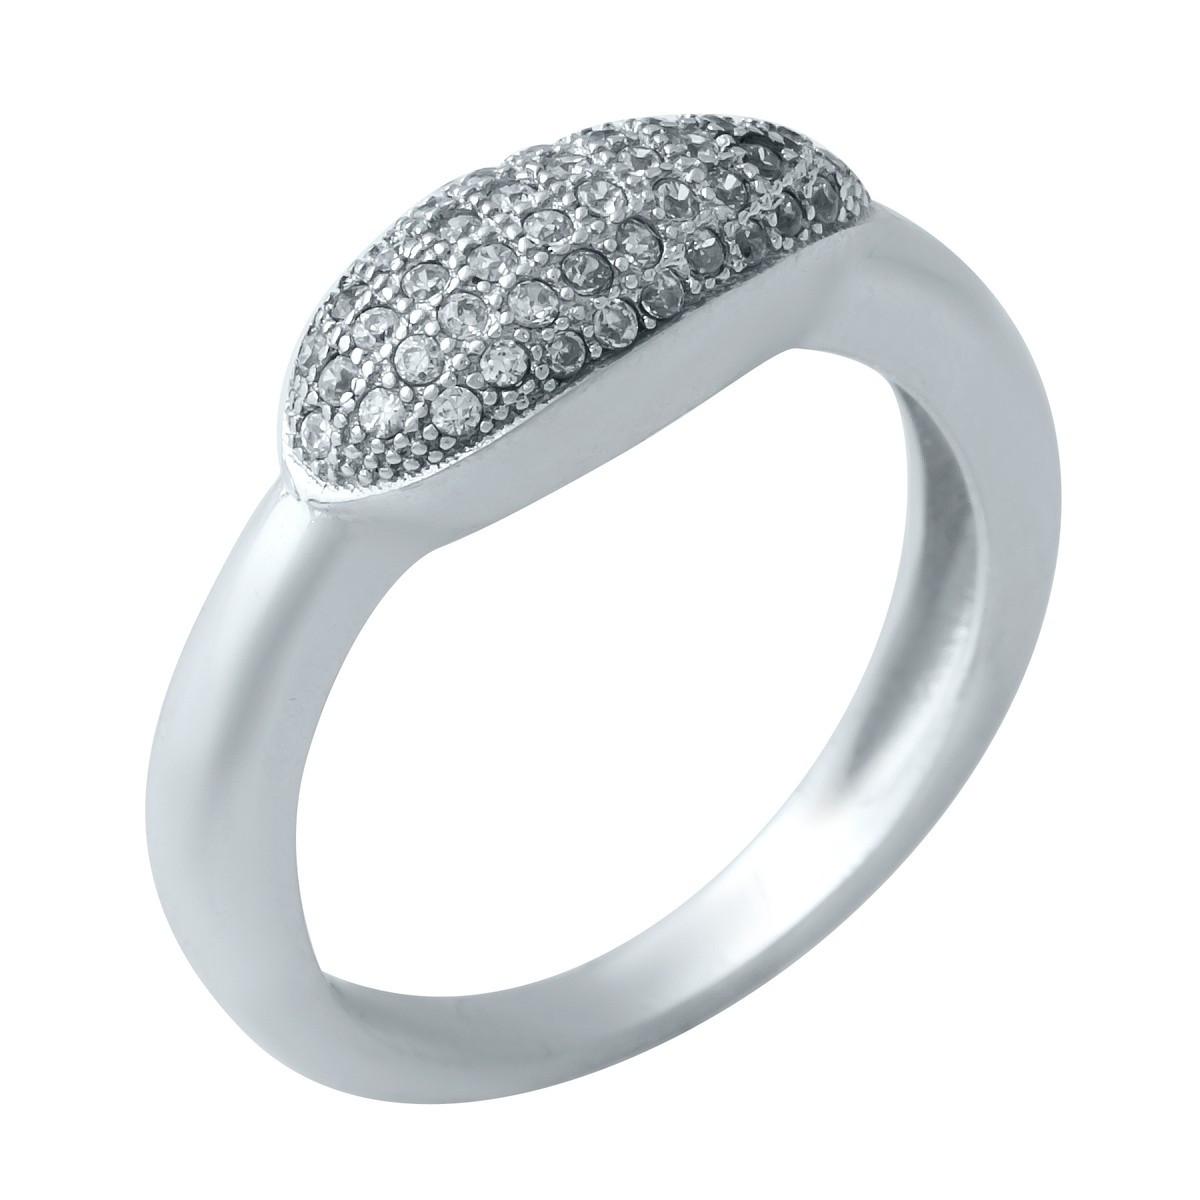 Серебряное кольцо DreamJewelry с фианитами (1923795) 16 размер